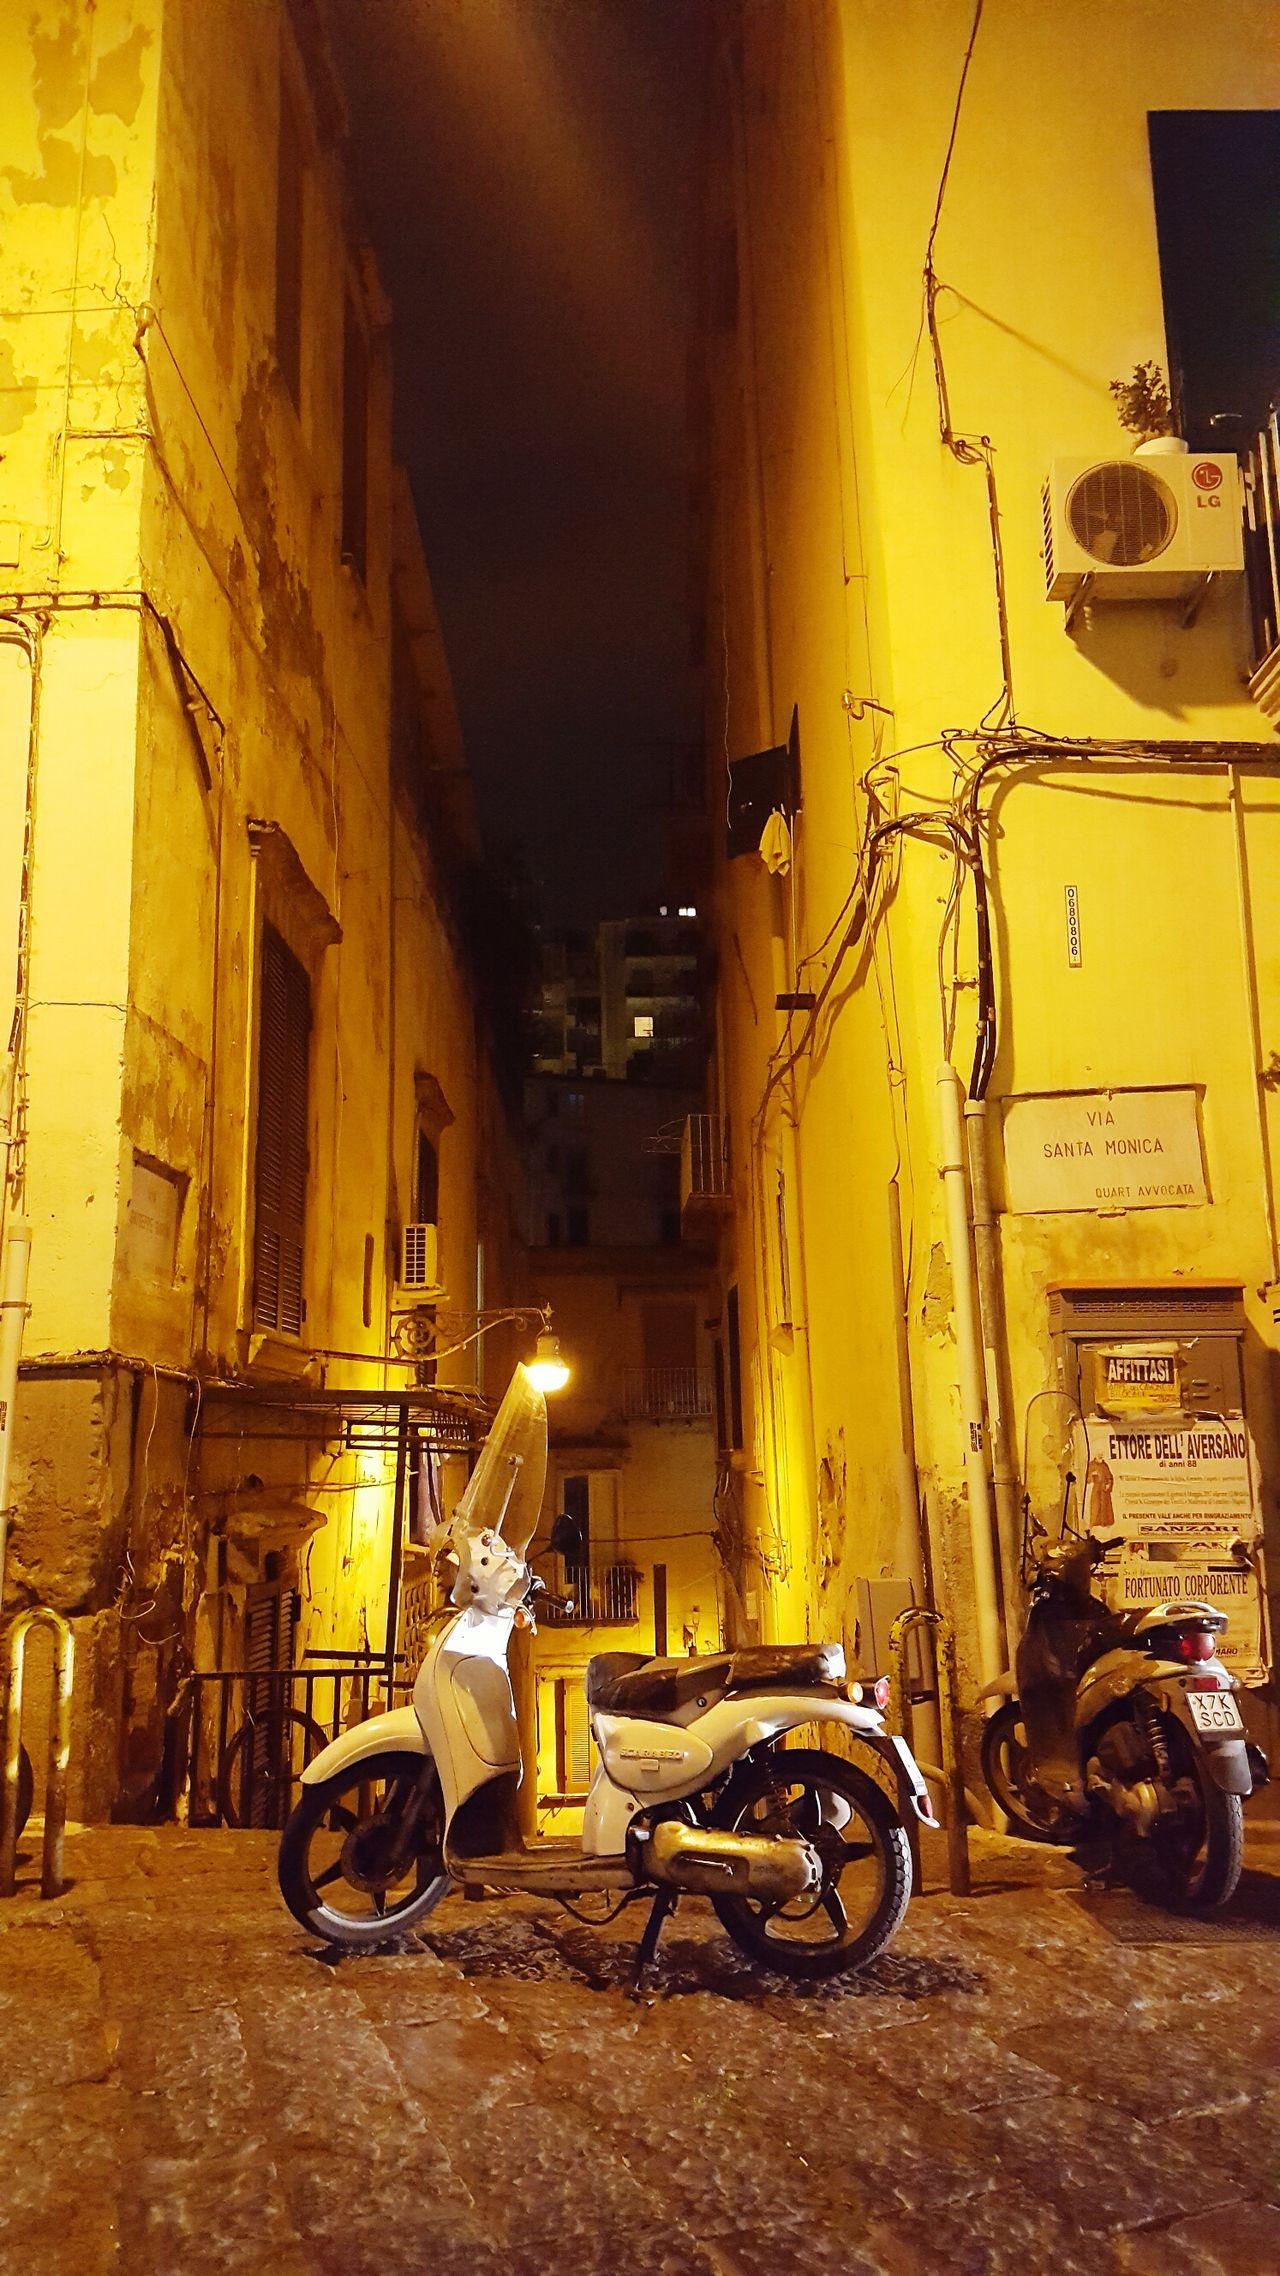 Architecture No People Night Urbanphotography Napoli Italia Napoli ❤ Italy🇮🇹 Outdoors City Built Structure Transportation Architecture